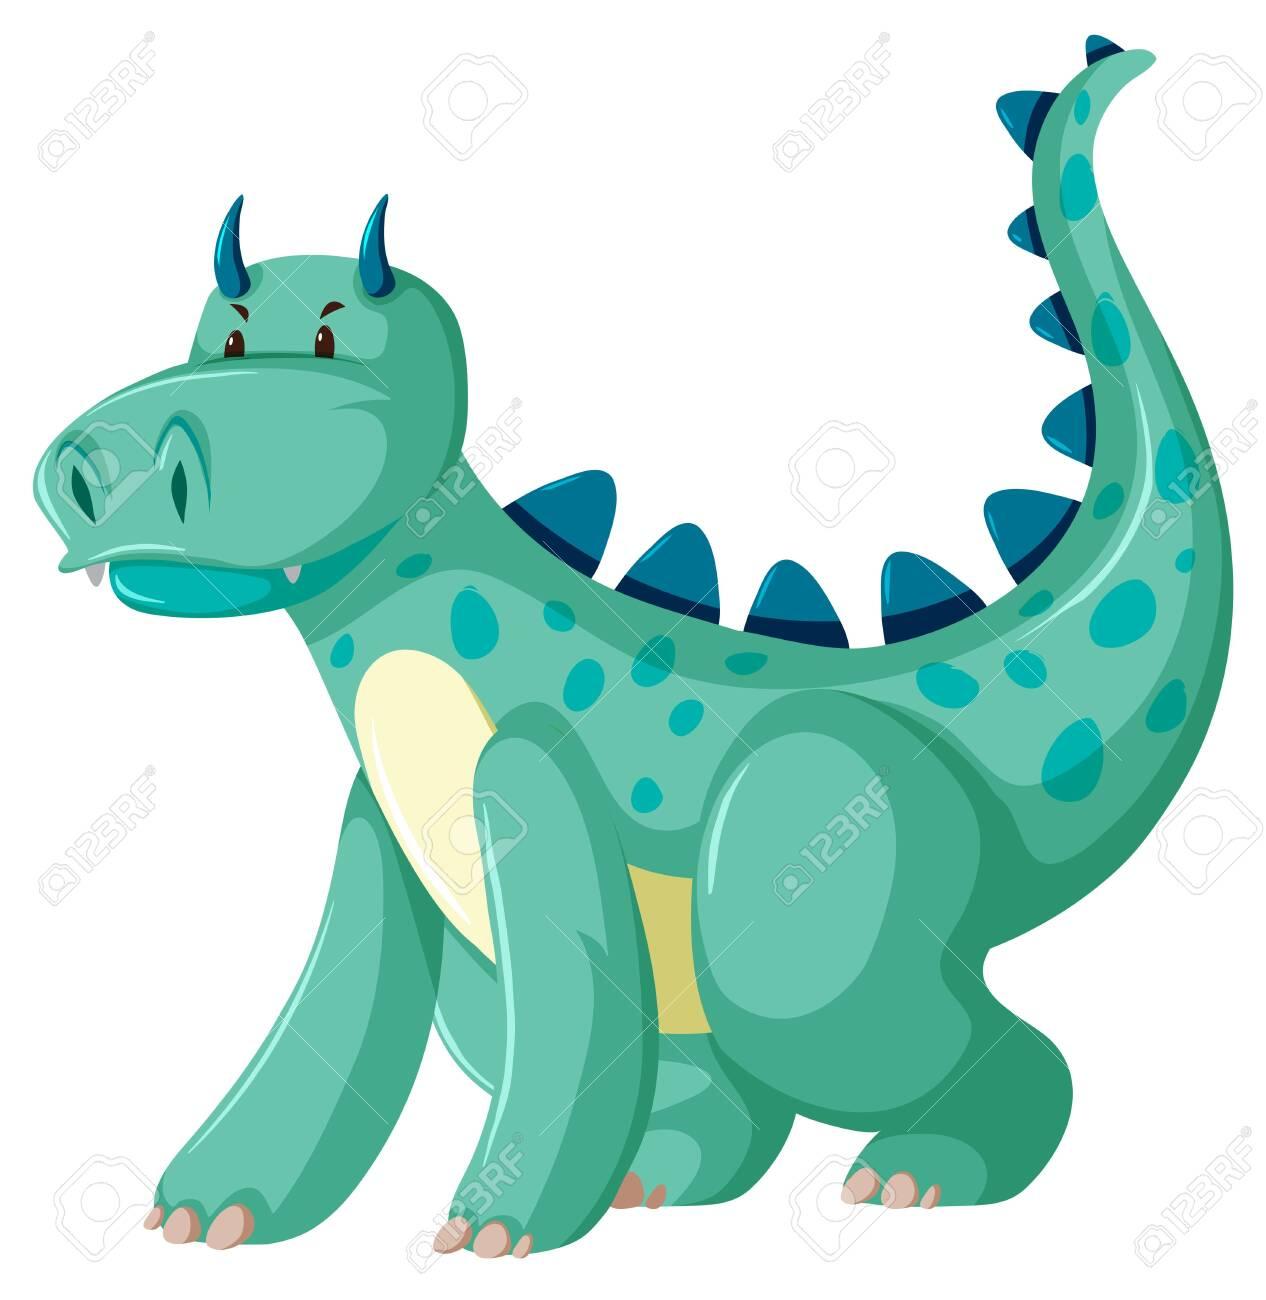 A green dragon character illustration - 124283448